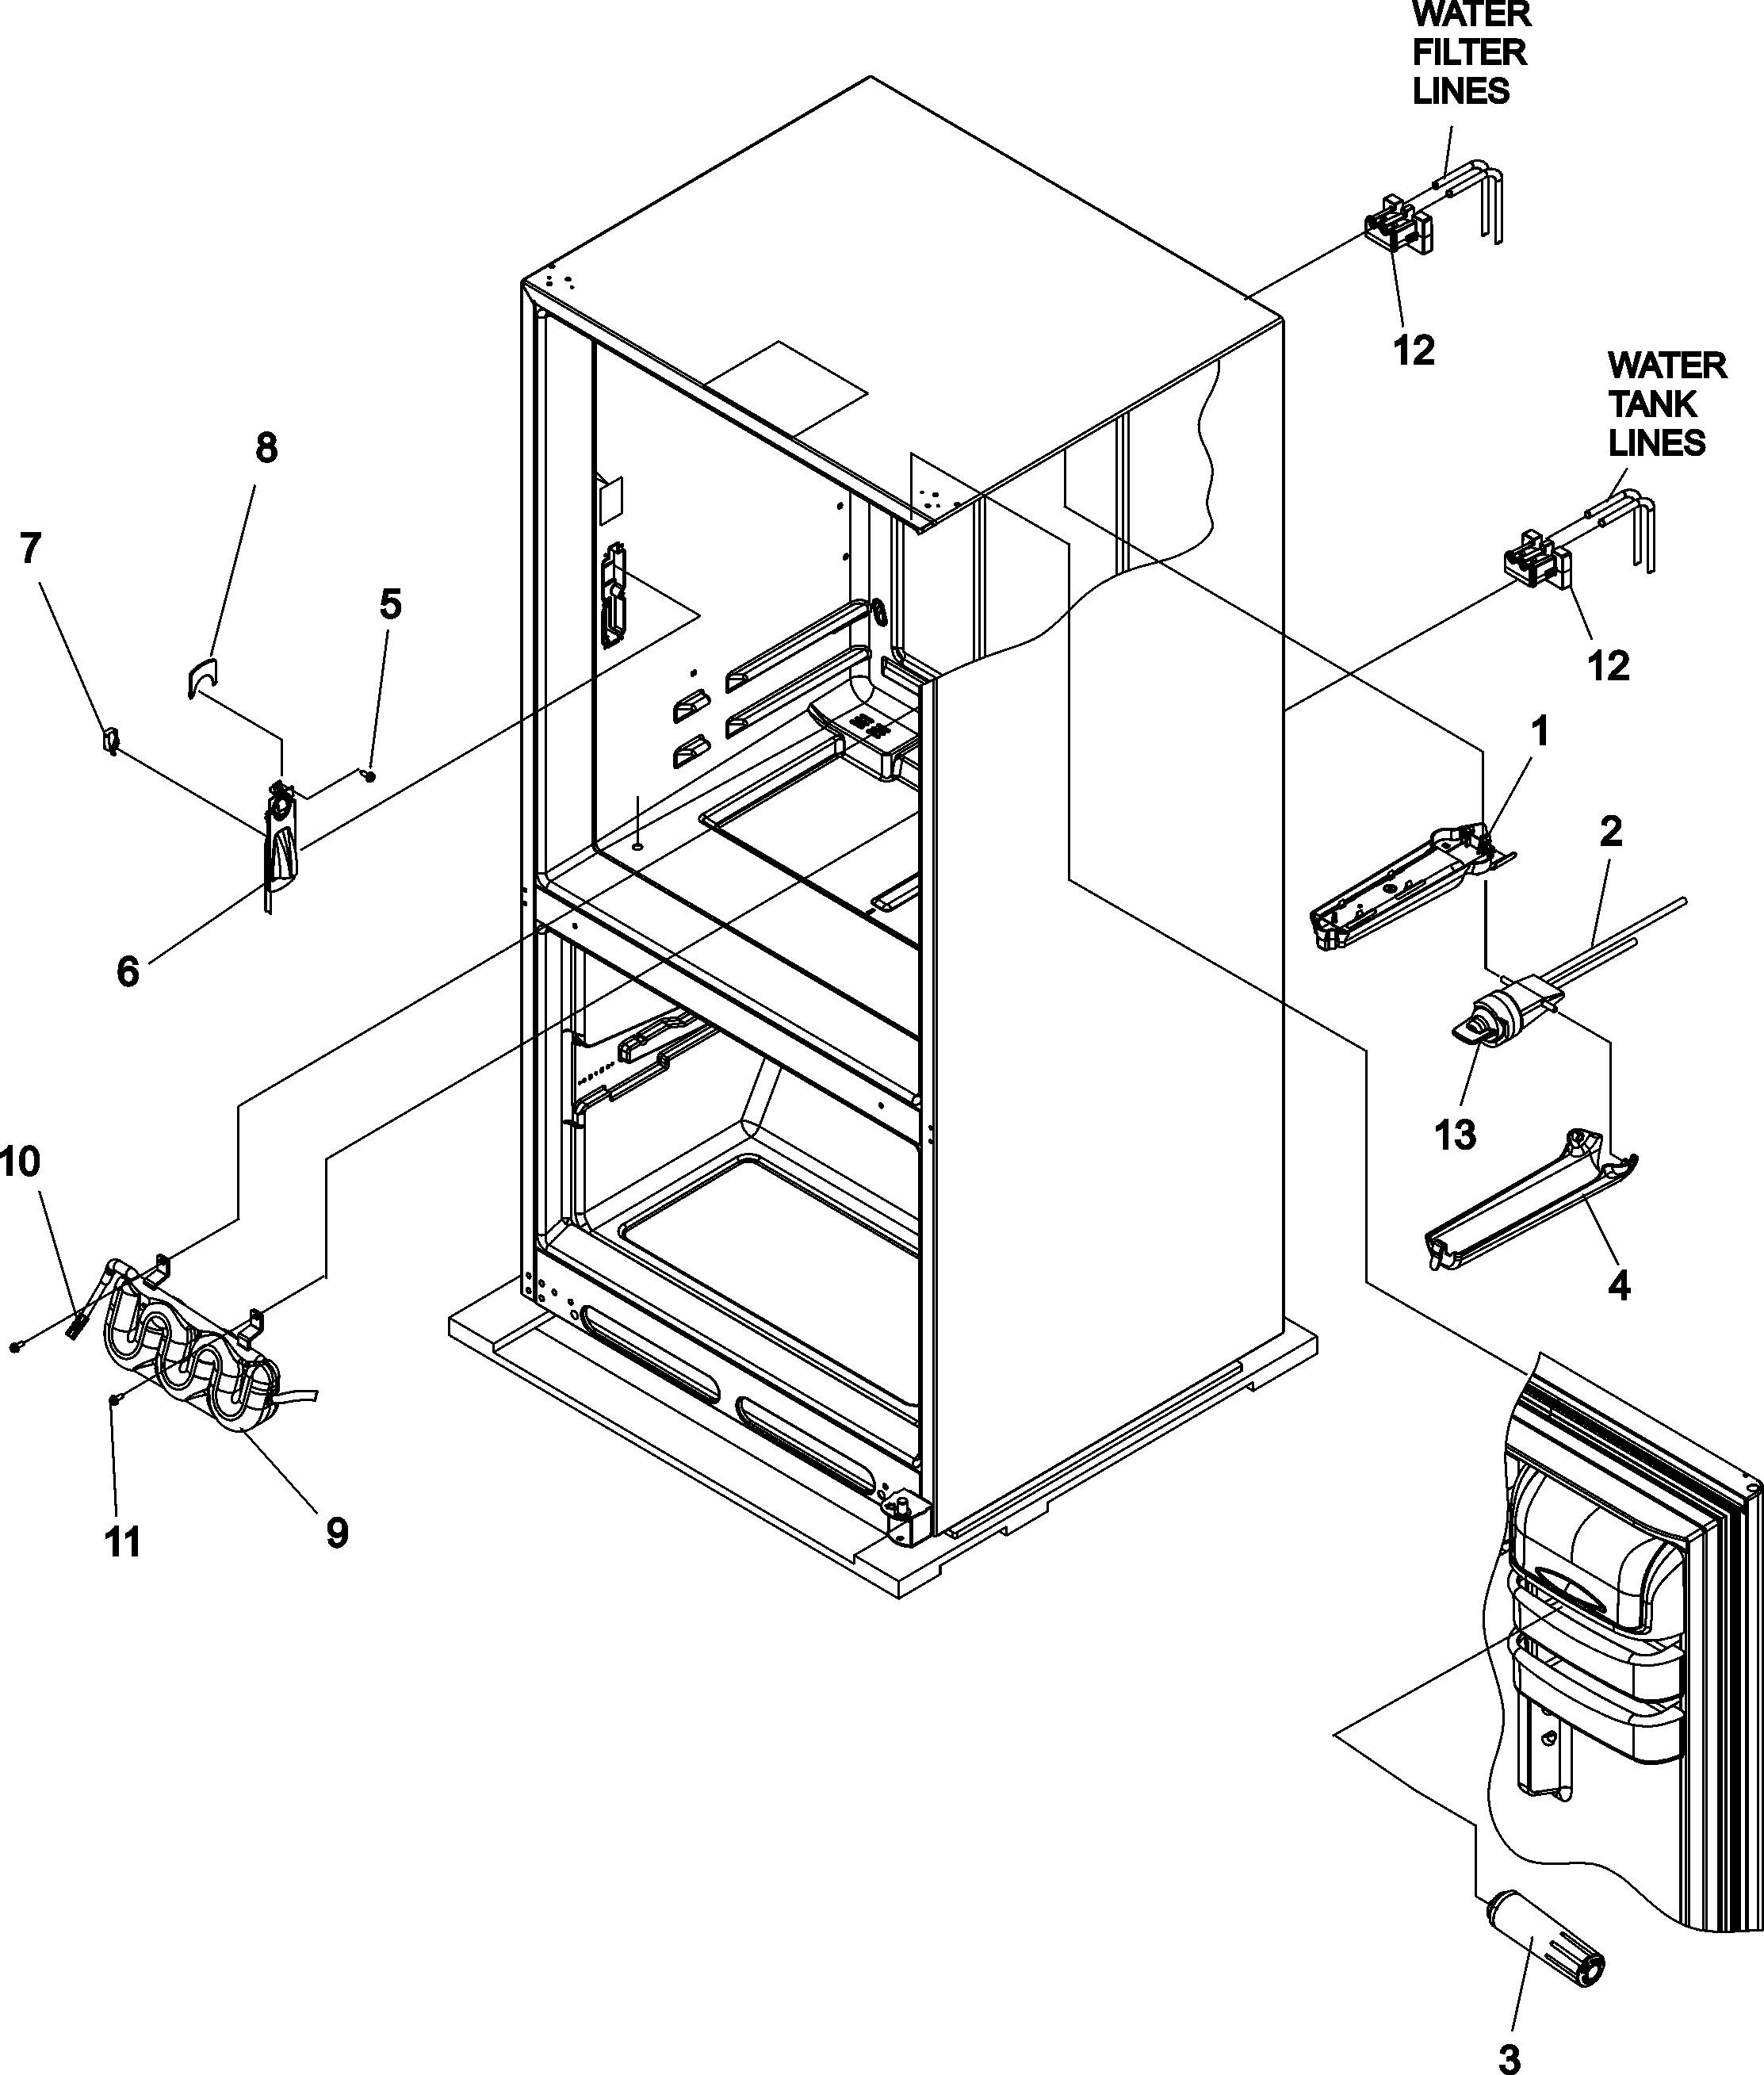 Car Interior Parts Diagram Amana Refrigerator Parts Model Abc2037dps Of Car Interior Parts Diagram